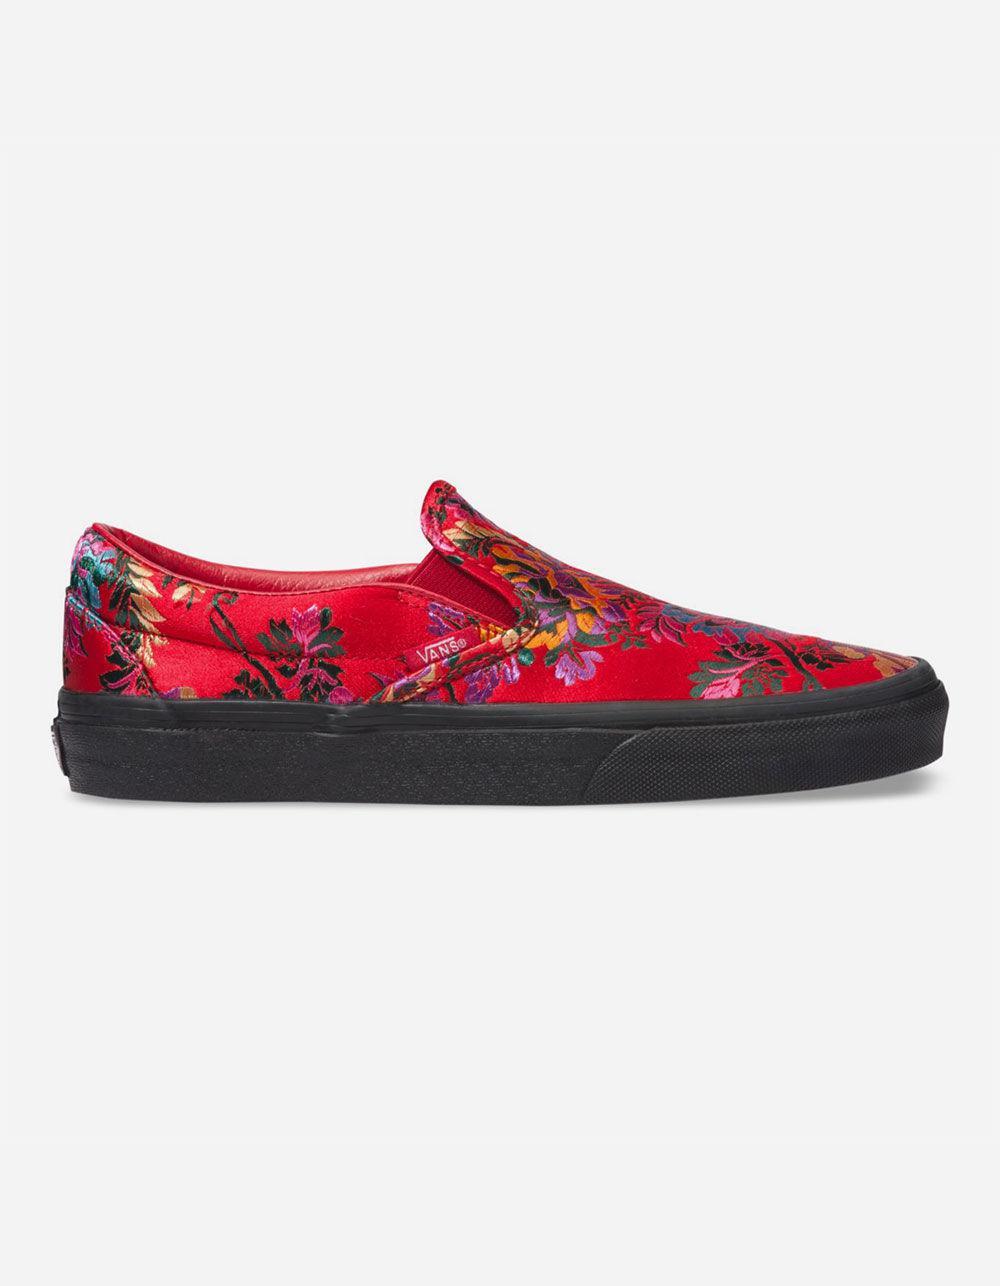 737c73edef Lyst - Vans Festival Satin Classic Slip-on Shoes in Red